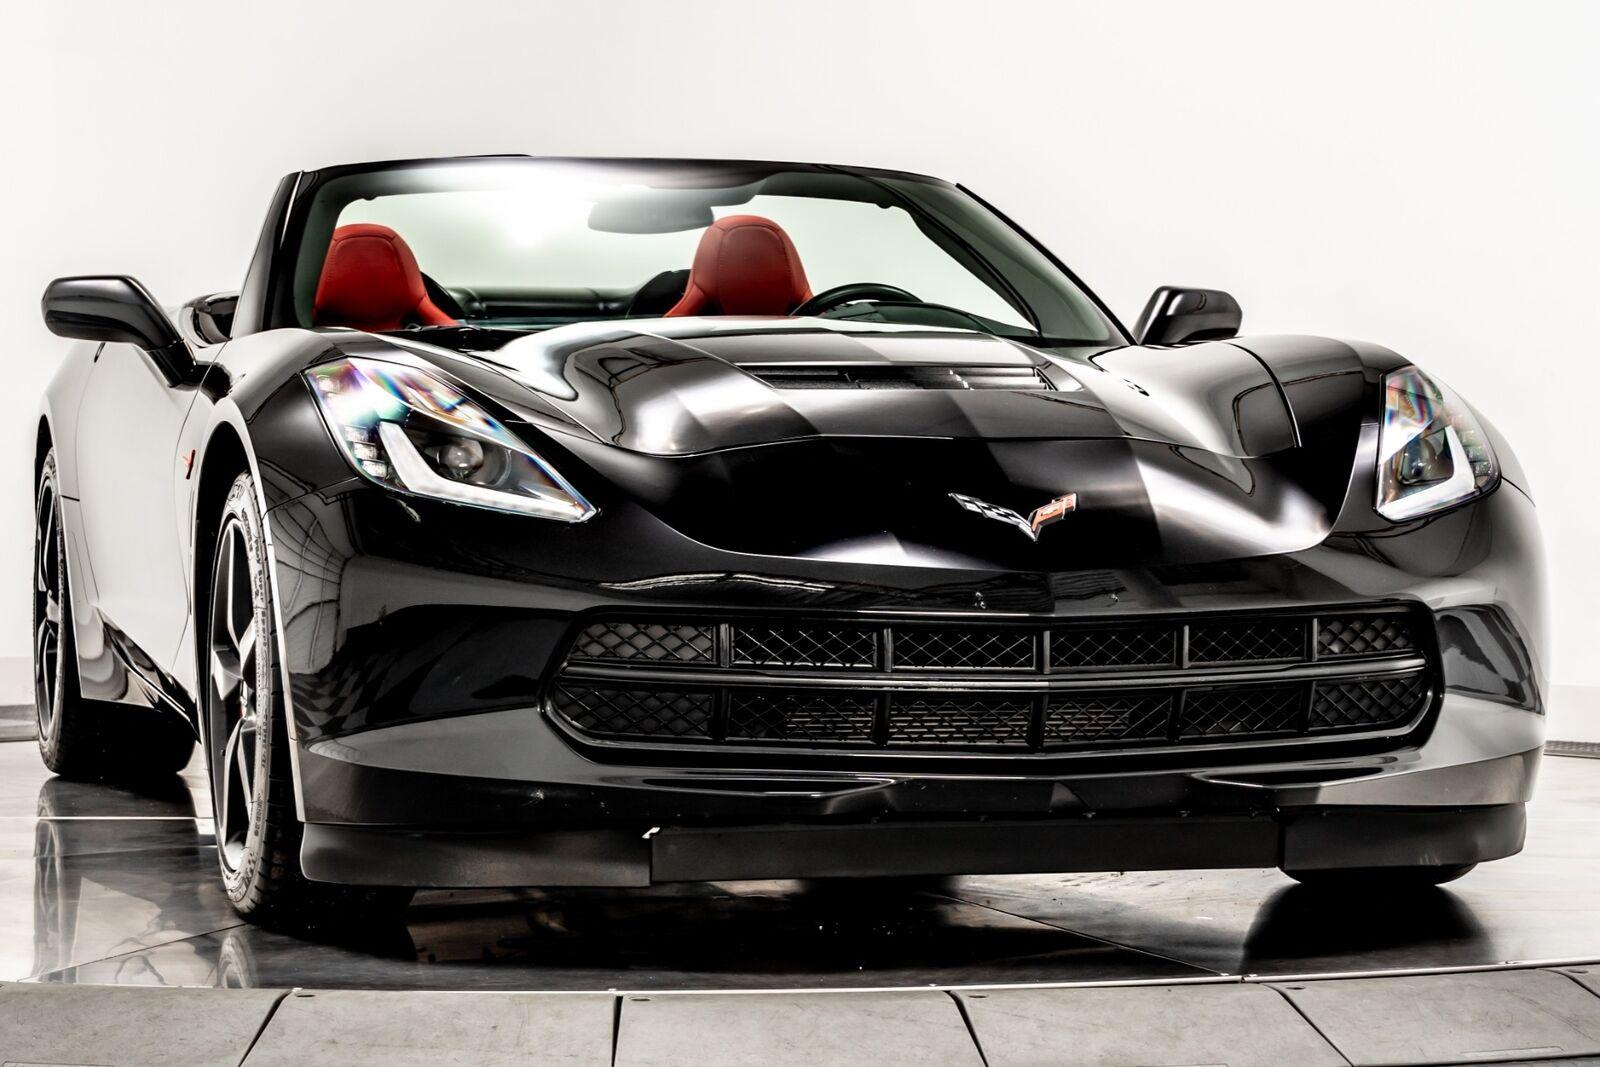 2014 Black Chevrolet Corvette Convertible 2LT   C7 Corvette Photo 2